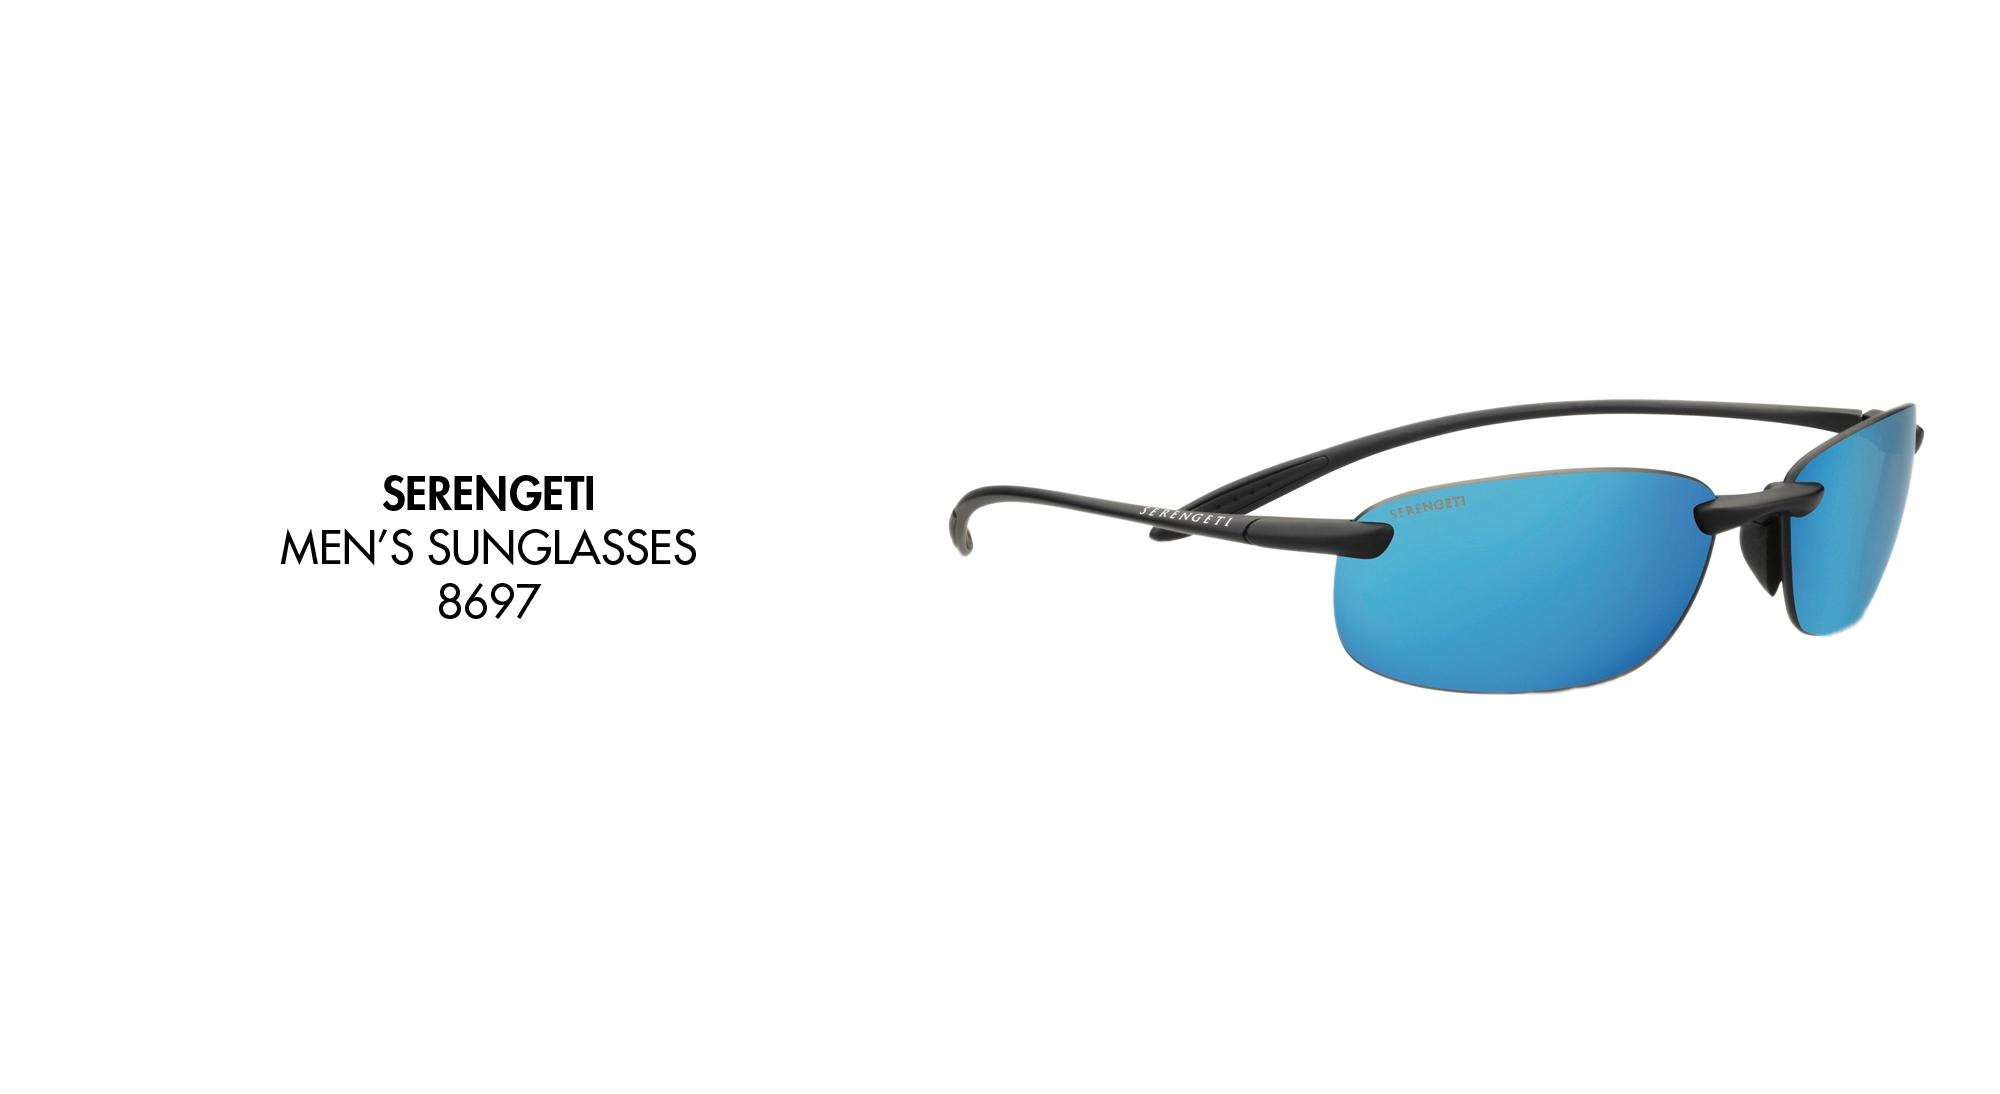 736abf209a29 Top 10 Serengeti Sunglasses